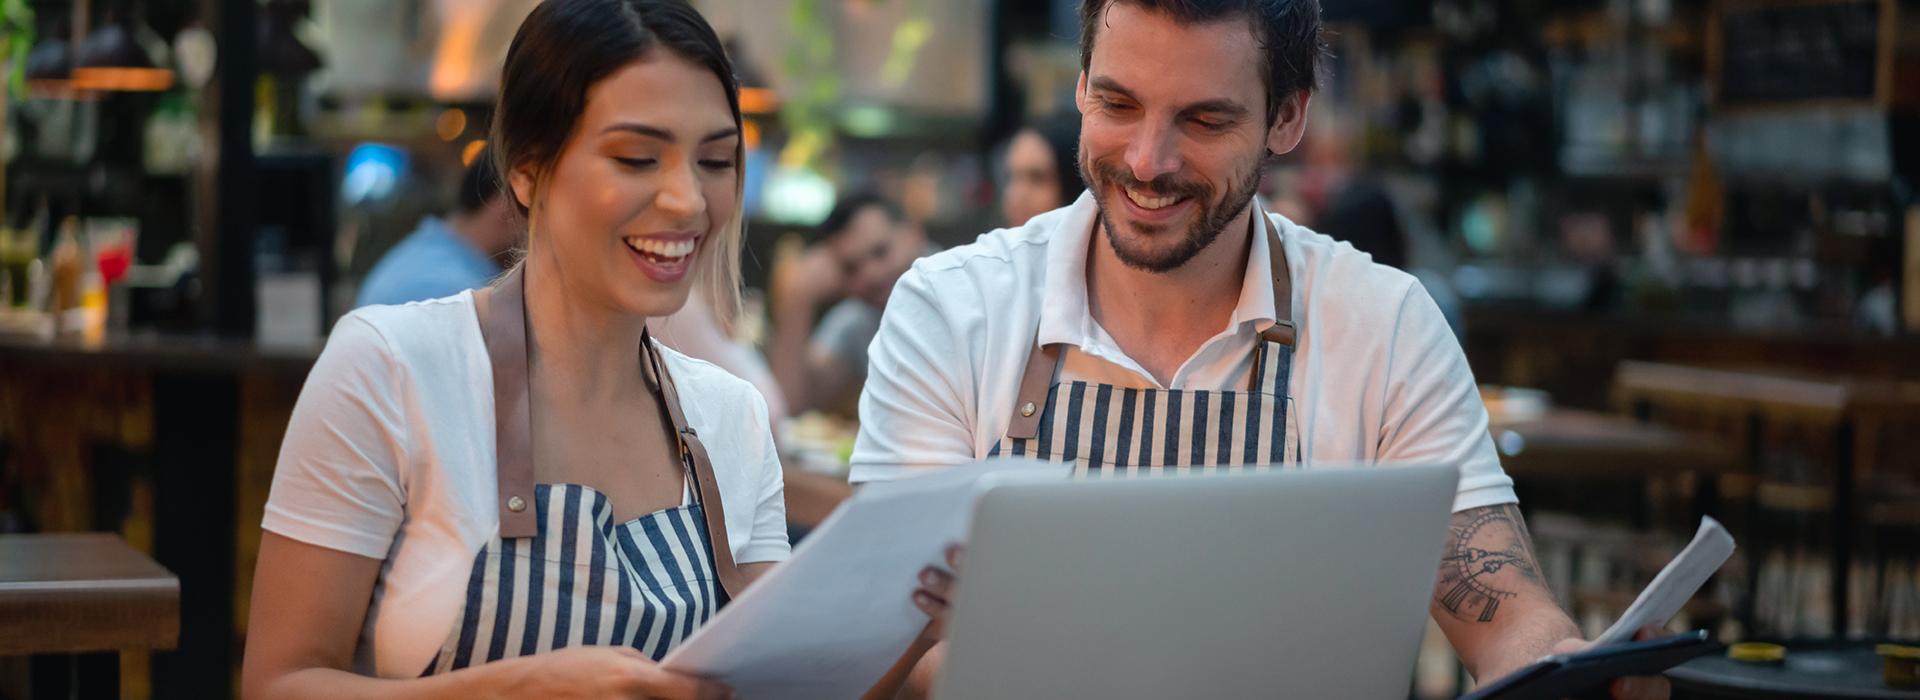 Restaurant employee training coworker on computer